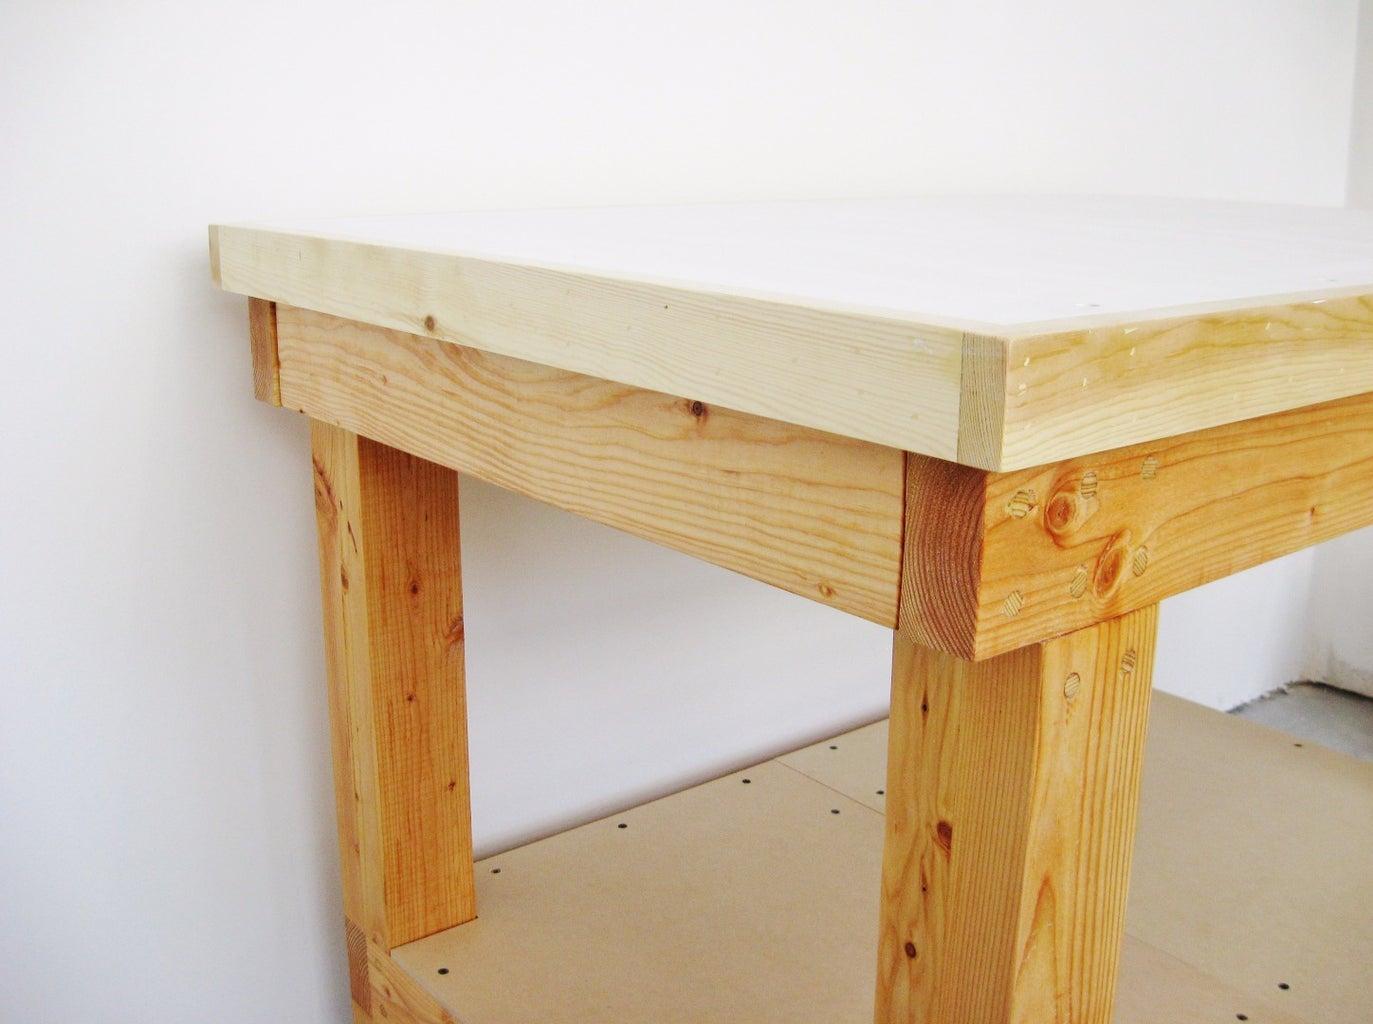 Simple Workshop Cart (with Hidden Drawer)